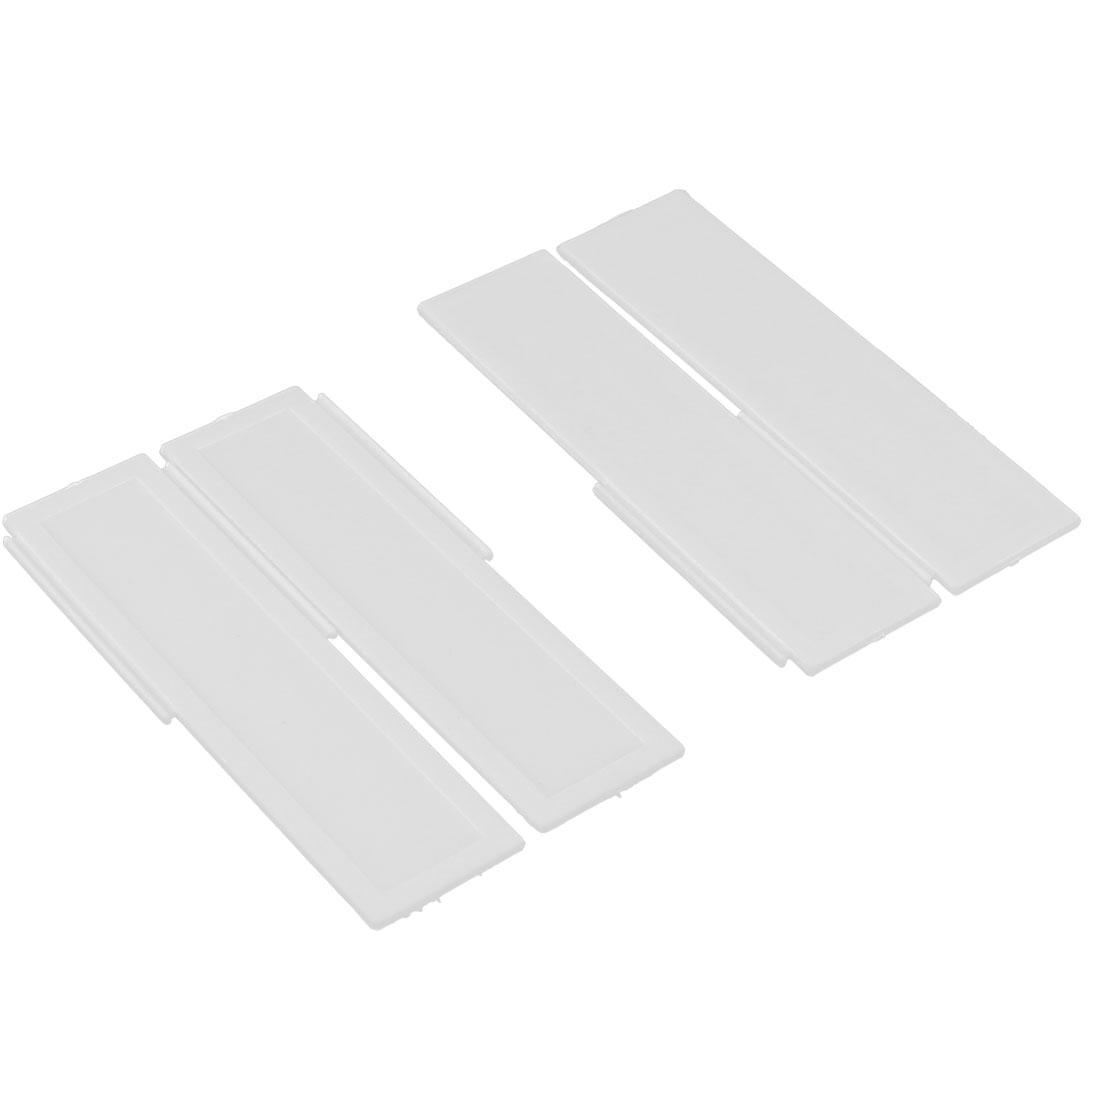 Household Plastic DIY Grid Drawer Divider Separators Storage Organizer Off White 4pcs